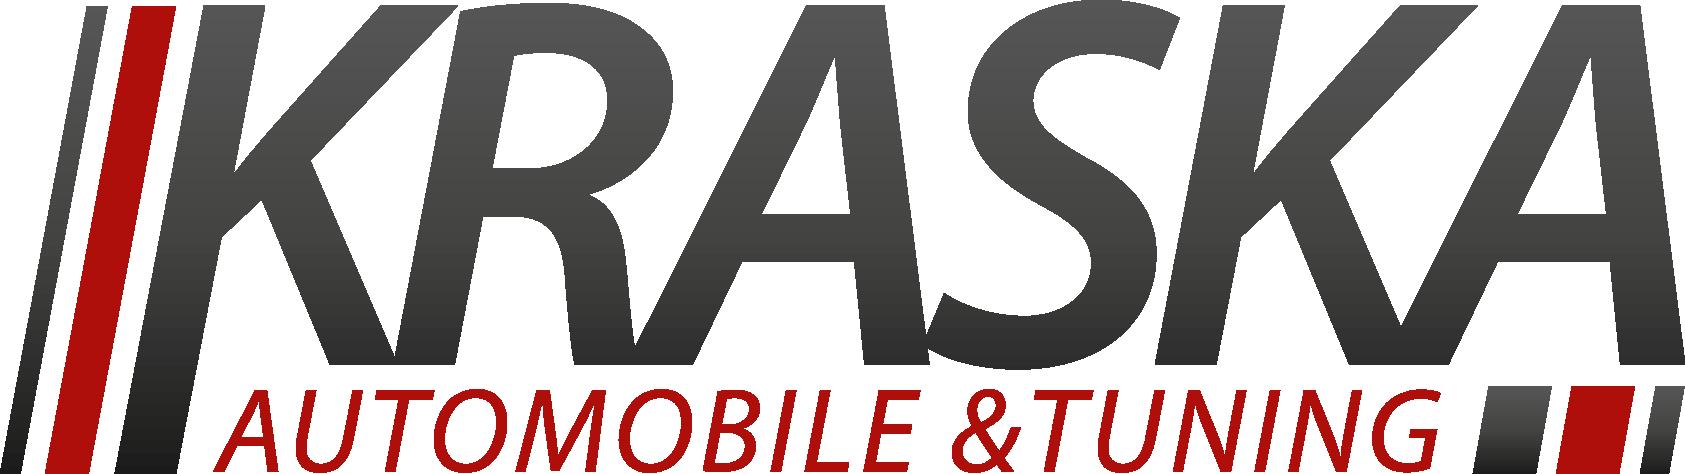 Kraska Automobile und Tuning Logo